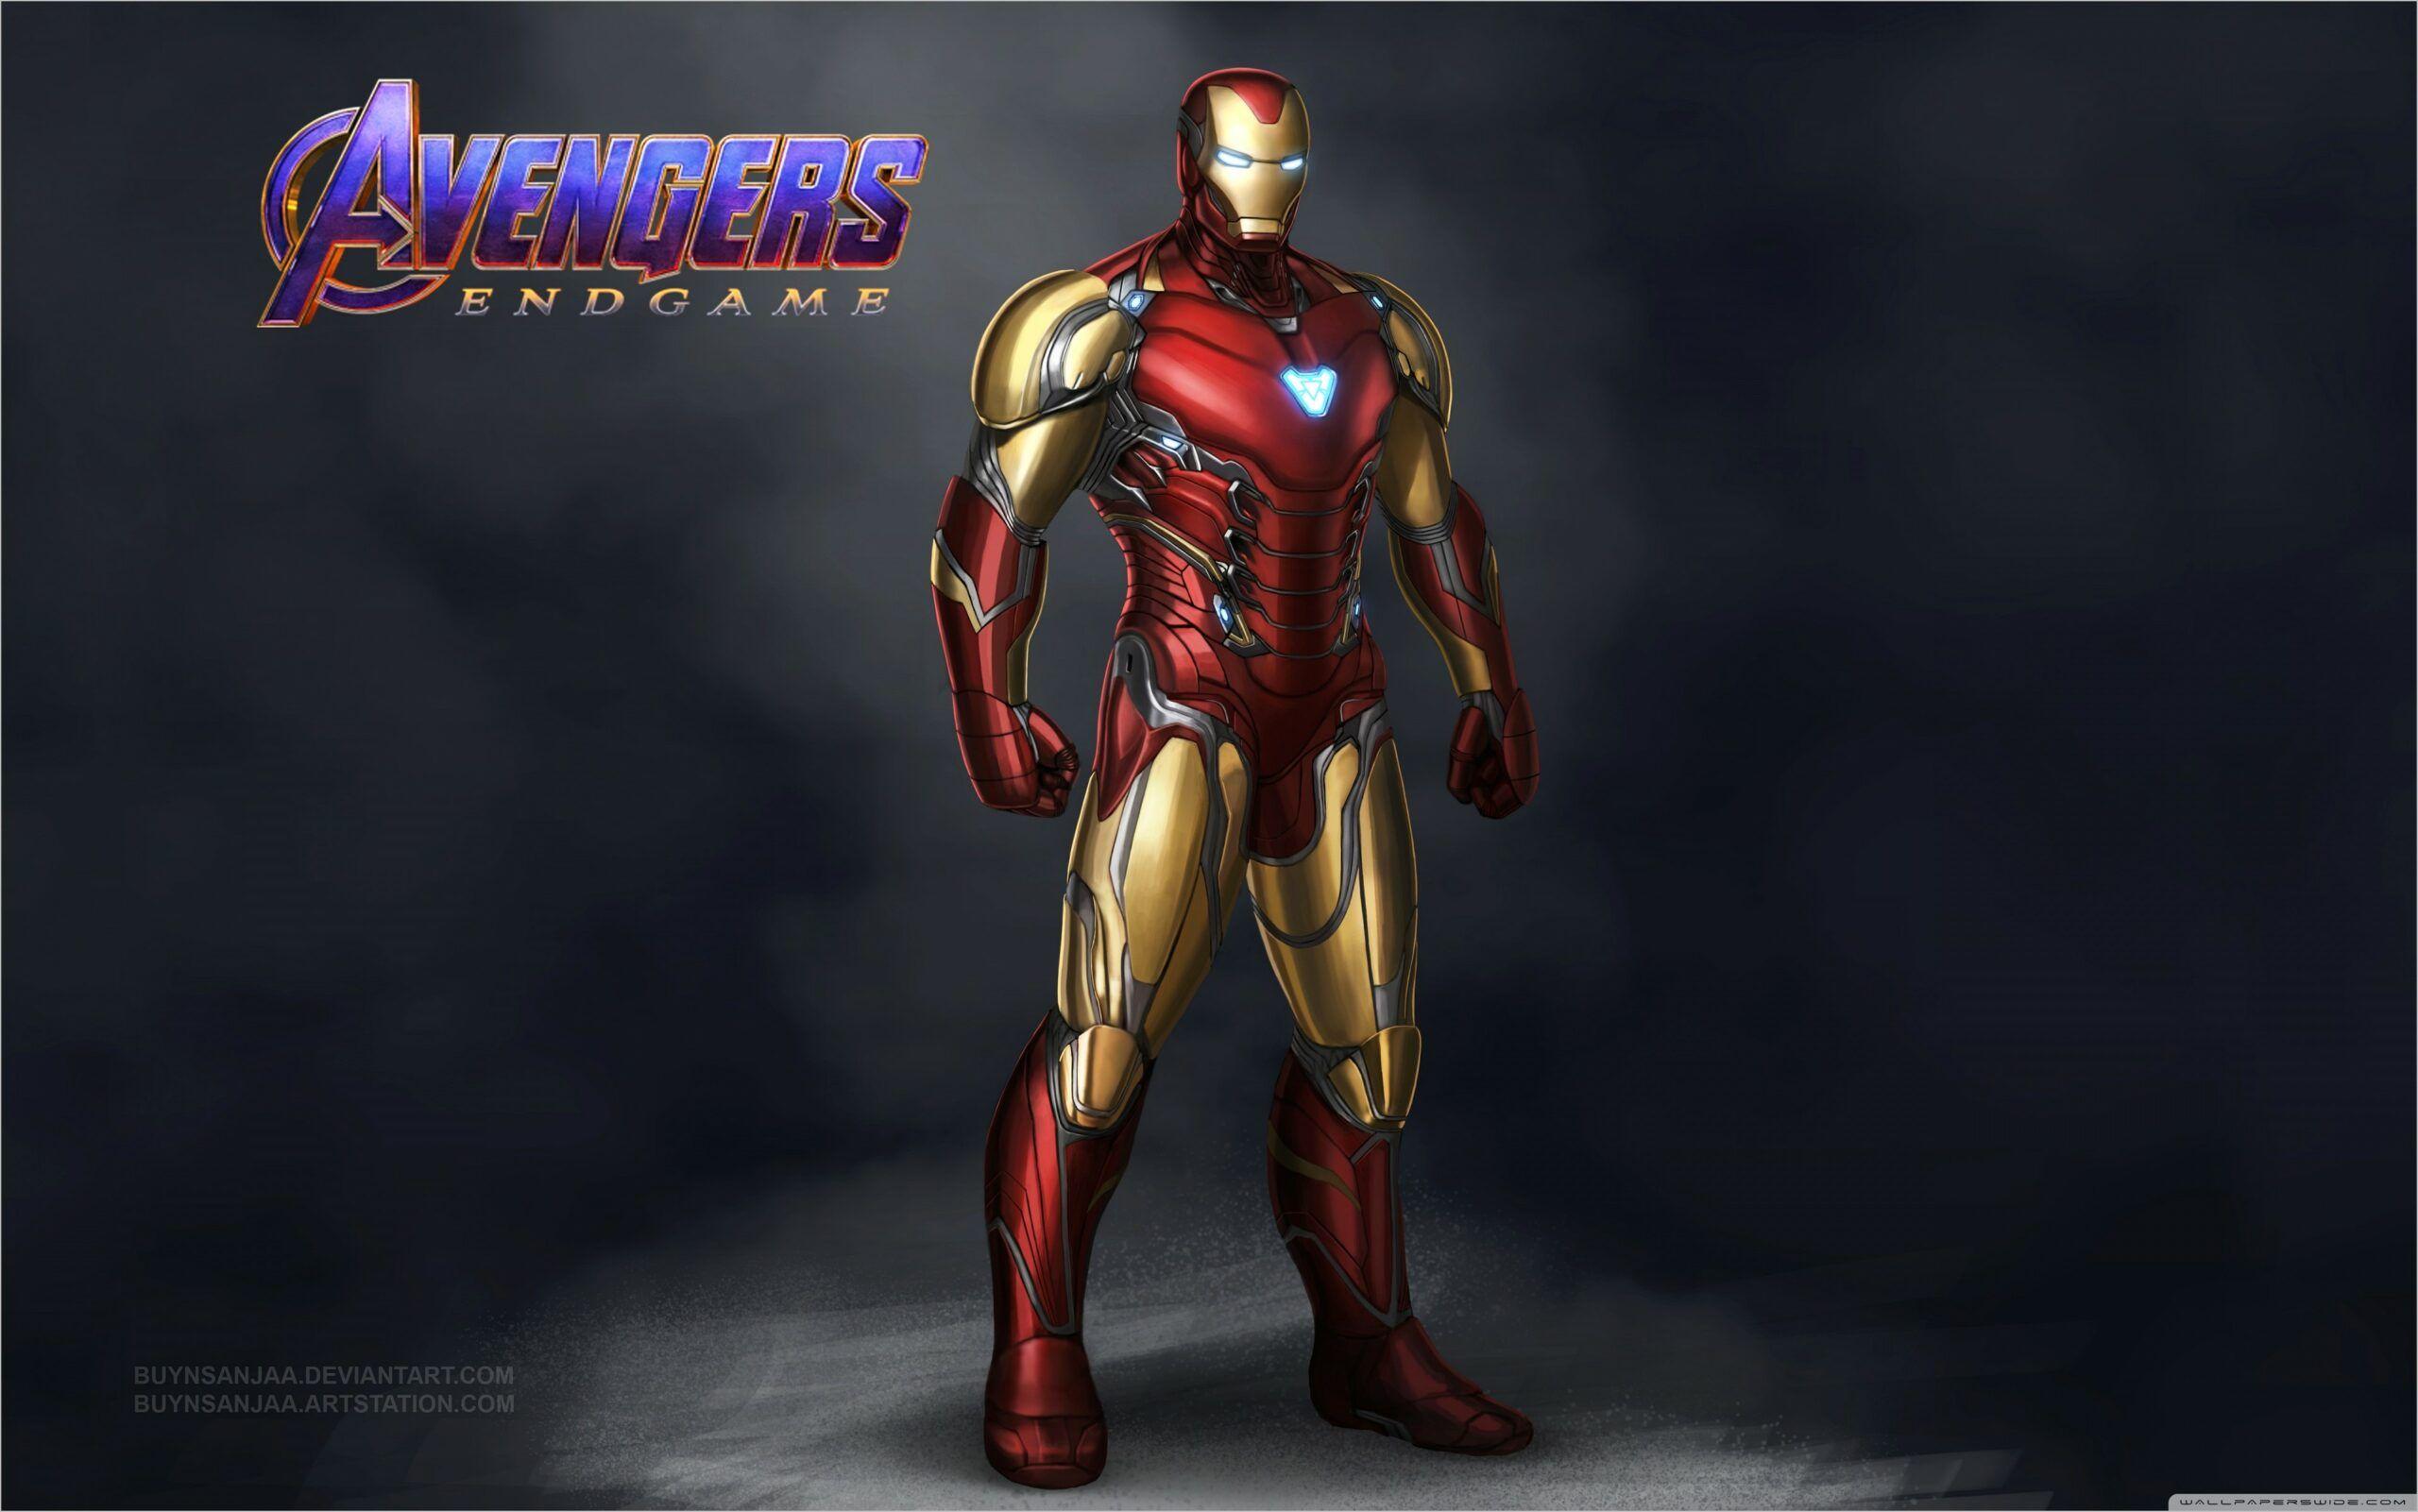 Iron Man Mark 85 Wallpaper 4k Iron Man Wallpaper Man Wallpaper Iron Man